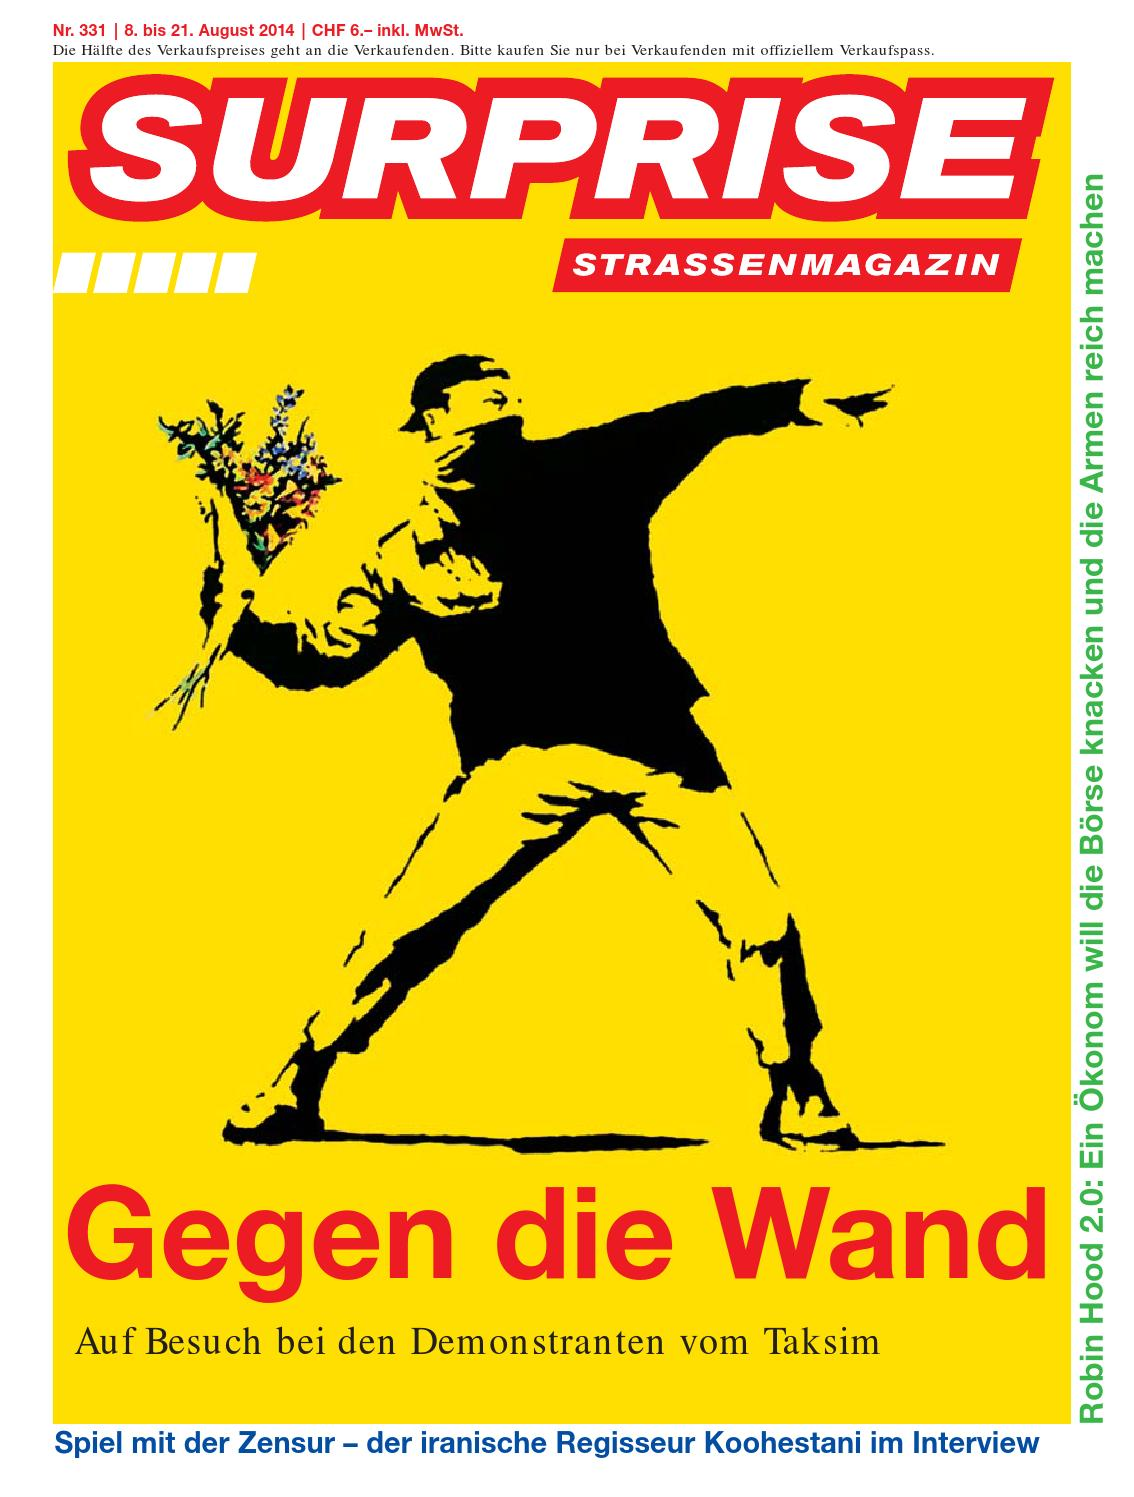 Surprise 331 rz web by Strassenmagazin Surprise - issuu